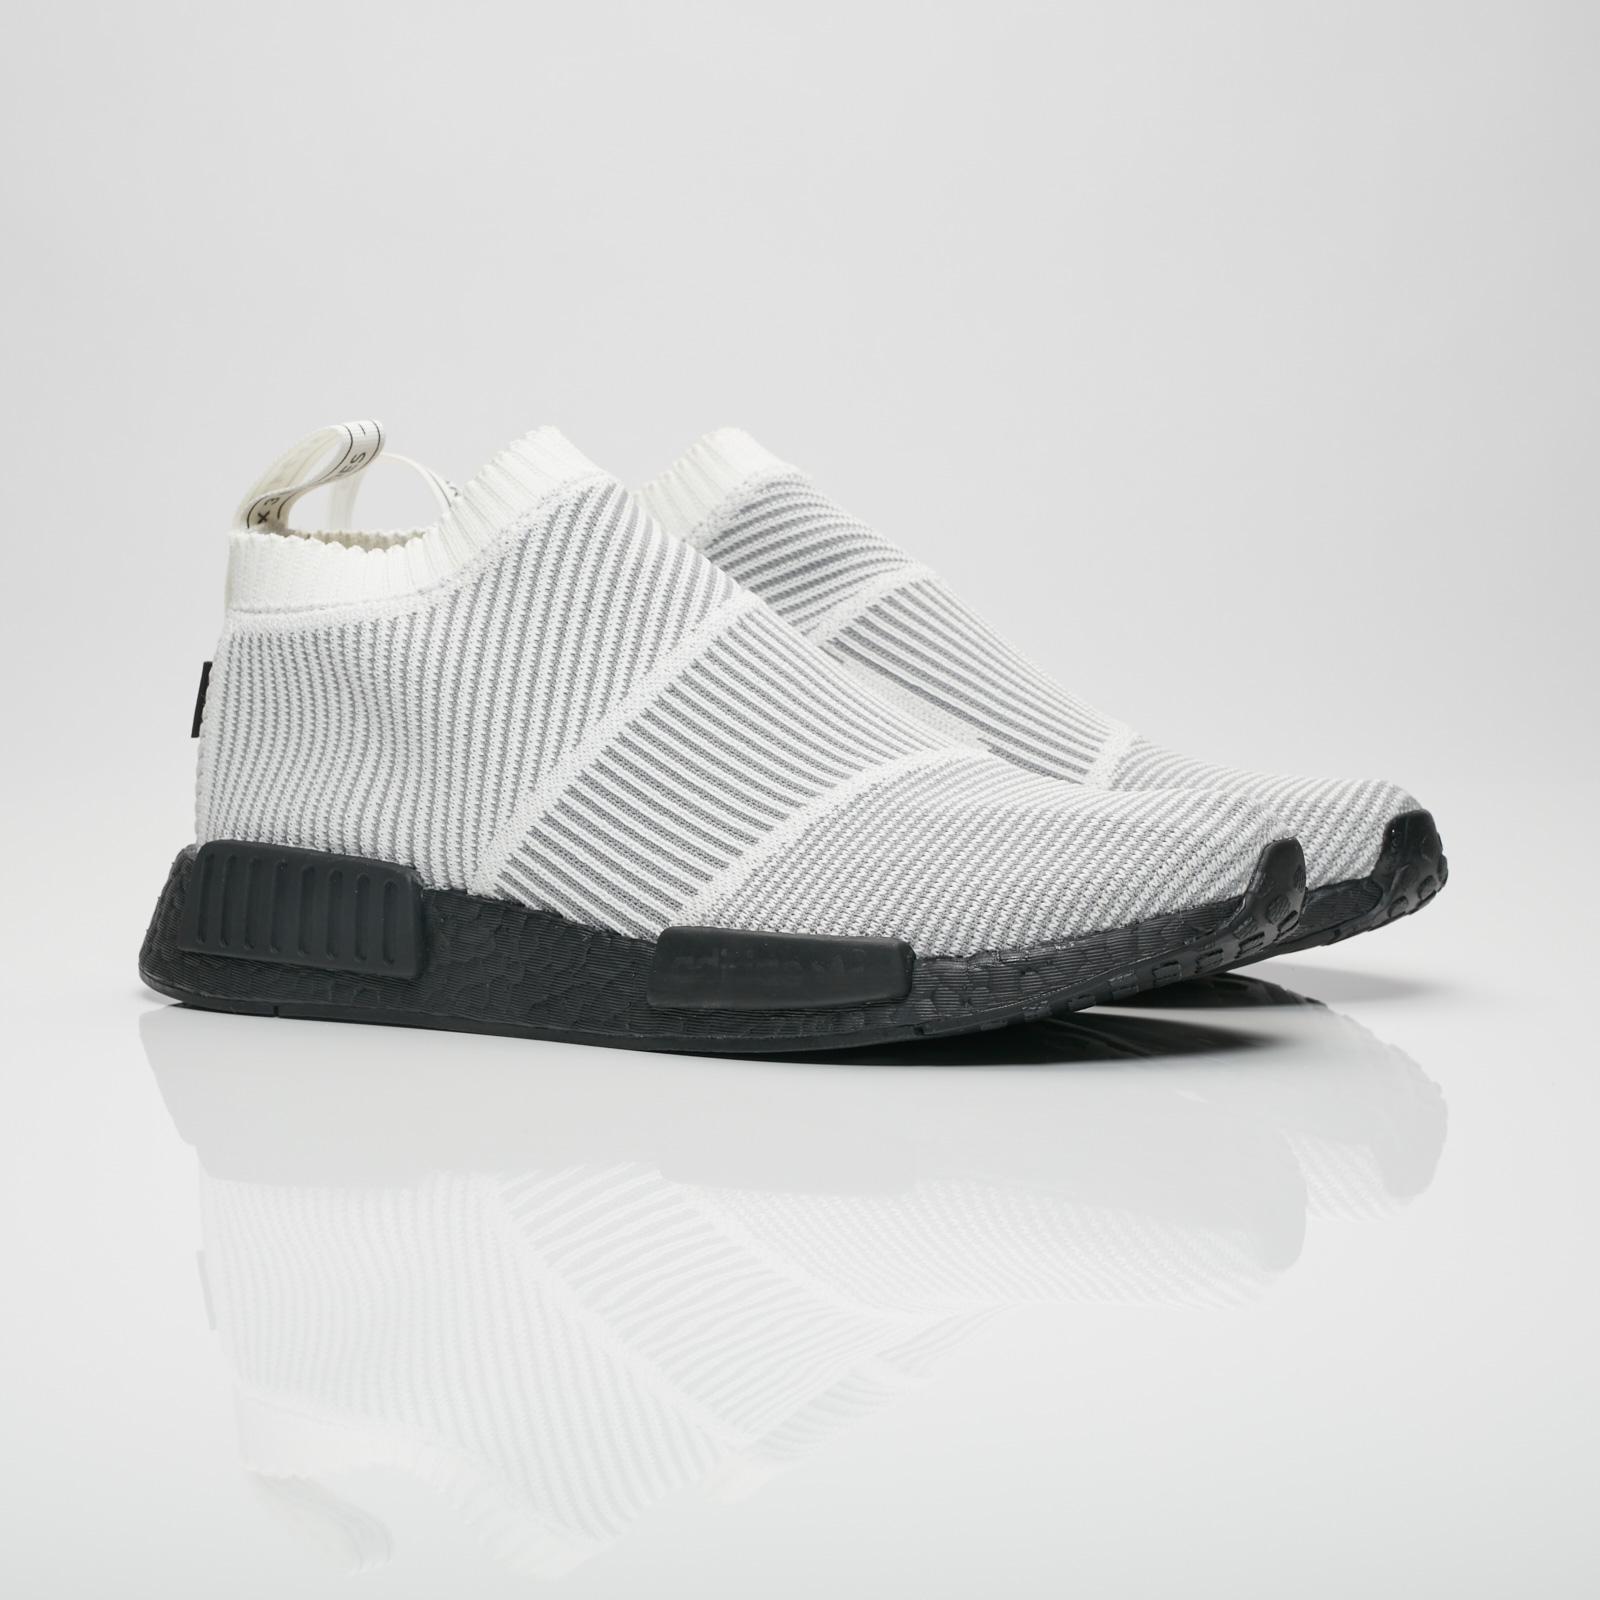 262a63d0f93f2 adidas NMD GORE-TEX Primeknit - By9404 - Sneakersnstuff